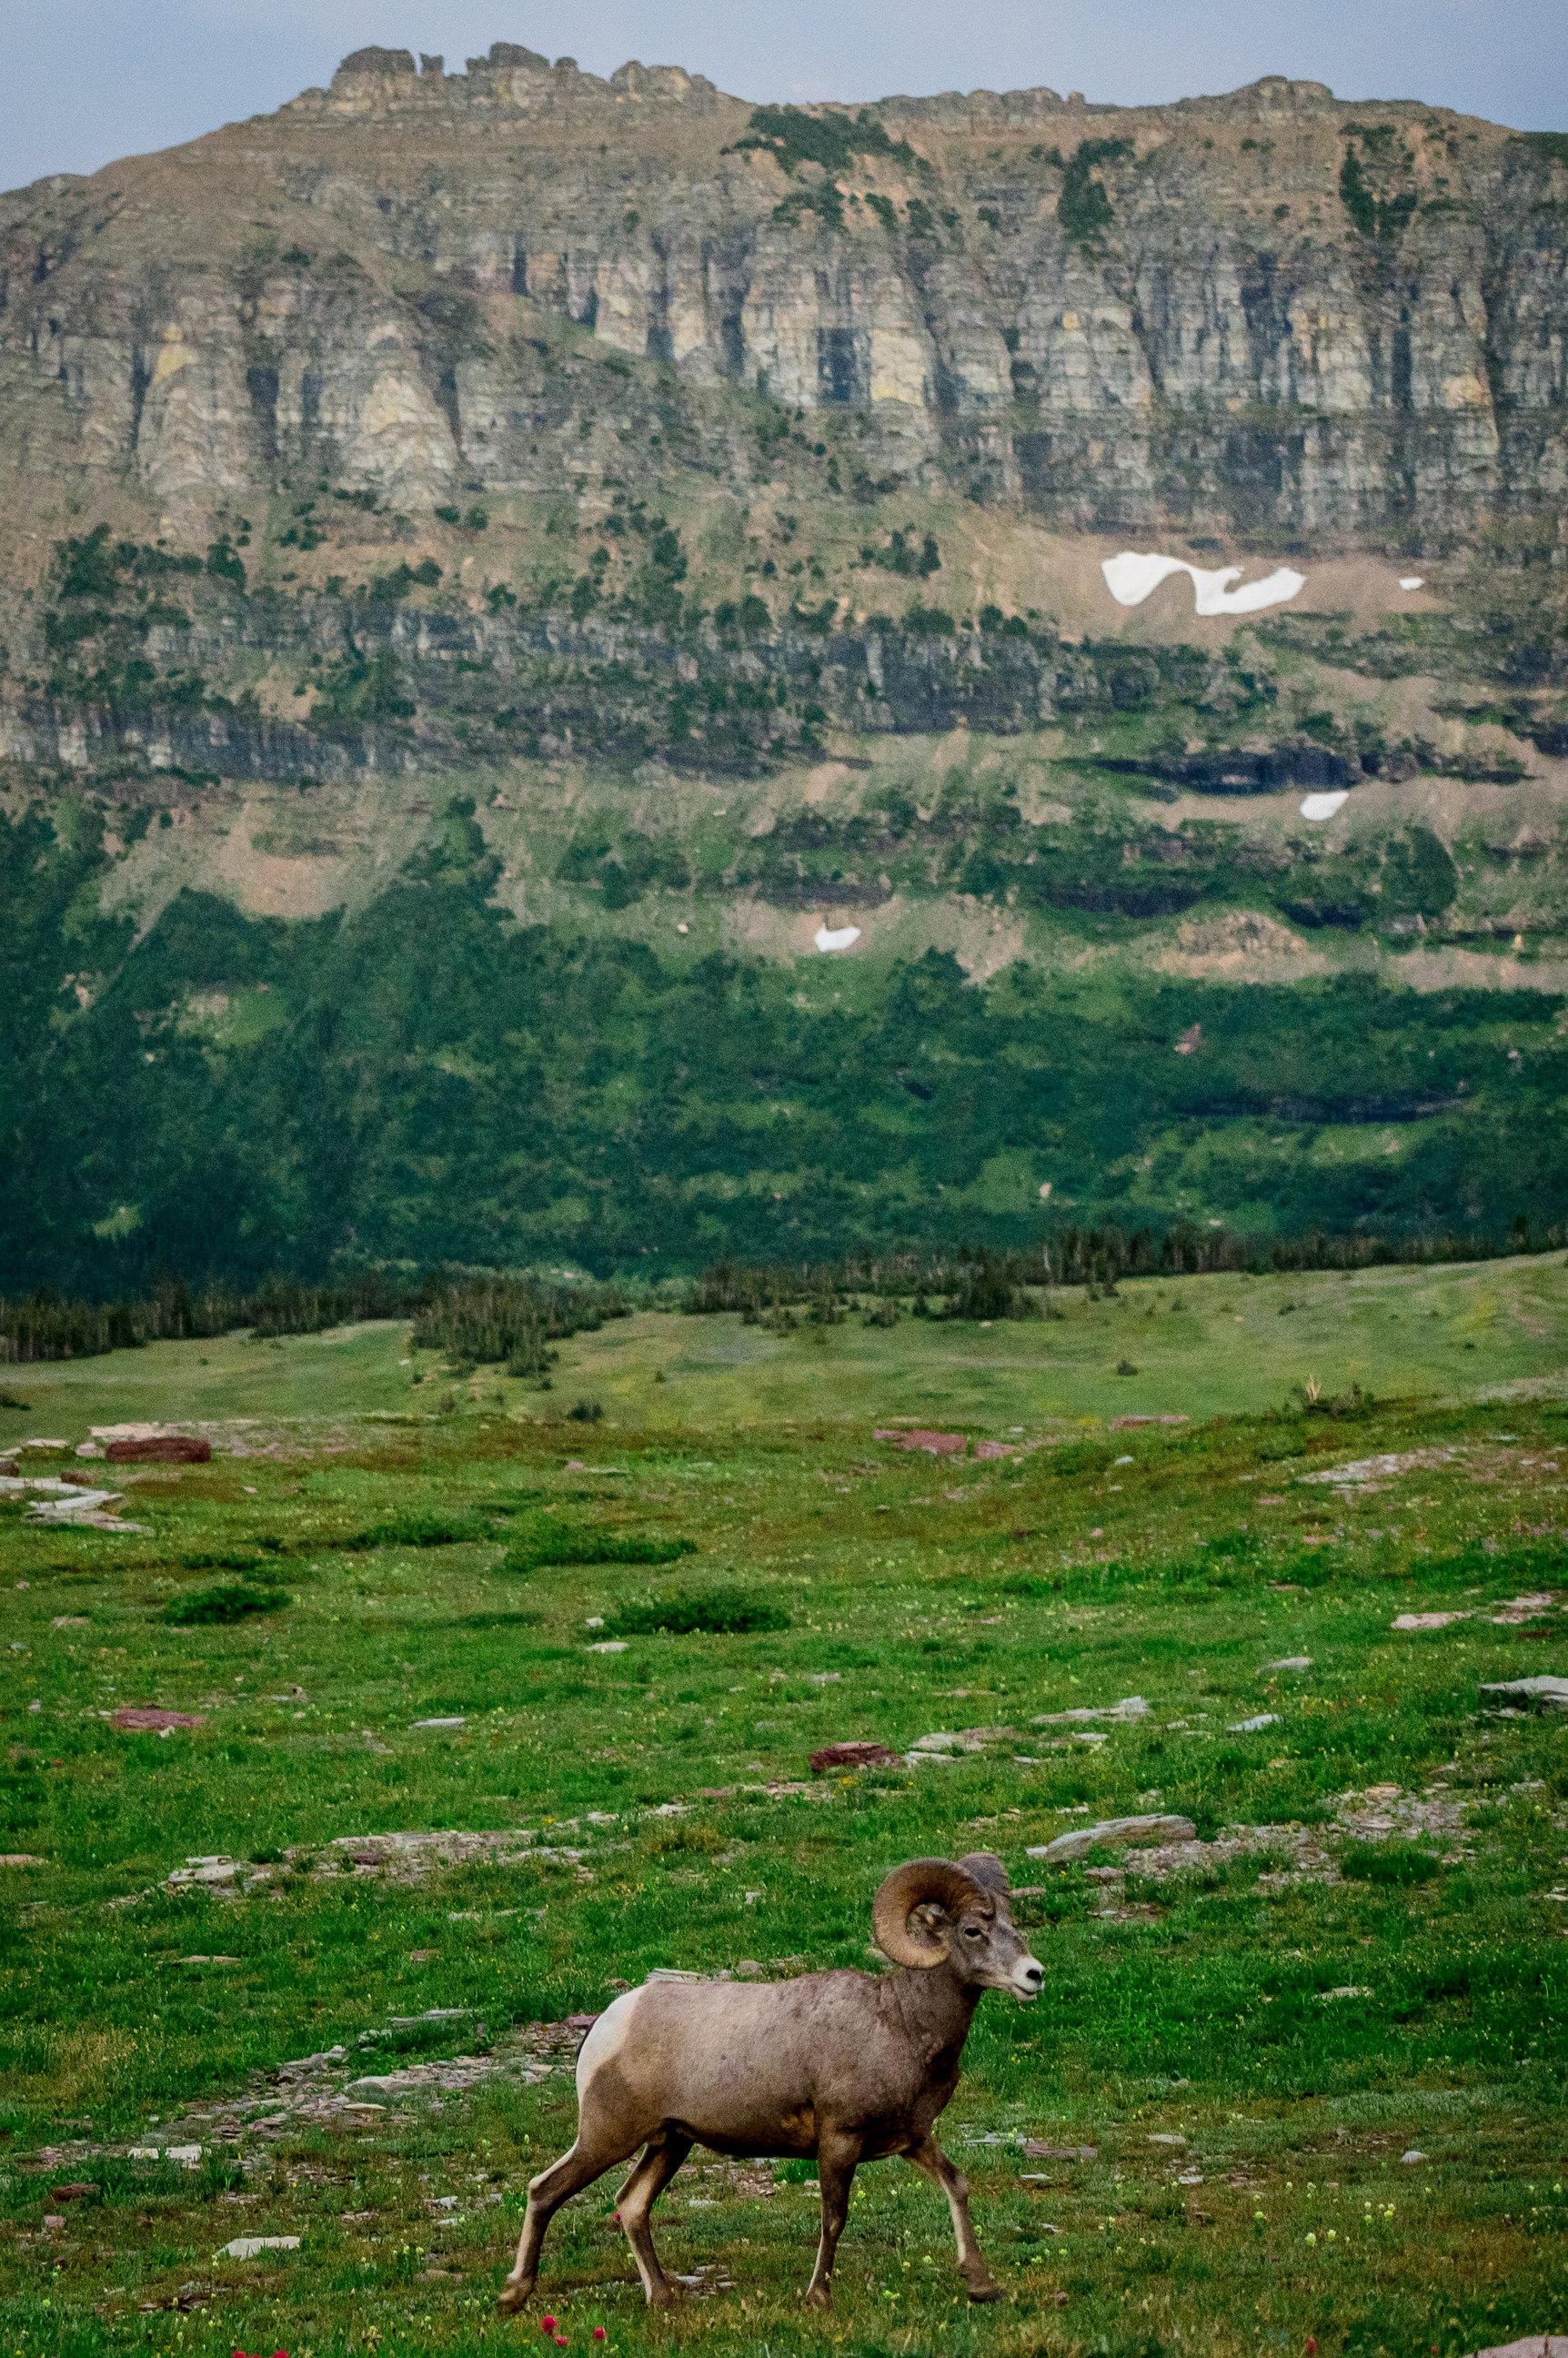 GlacierNationalPark2019-0643.jpg